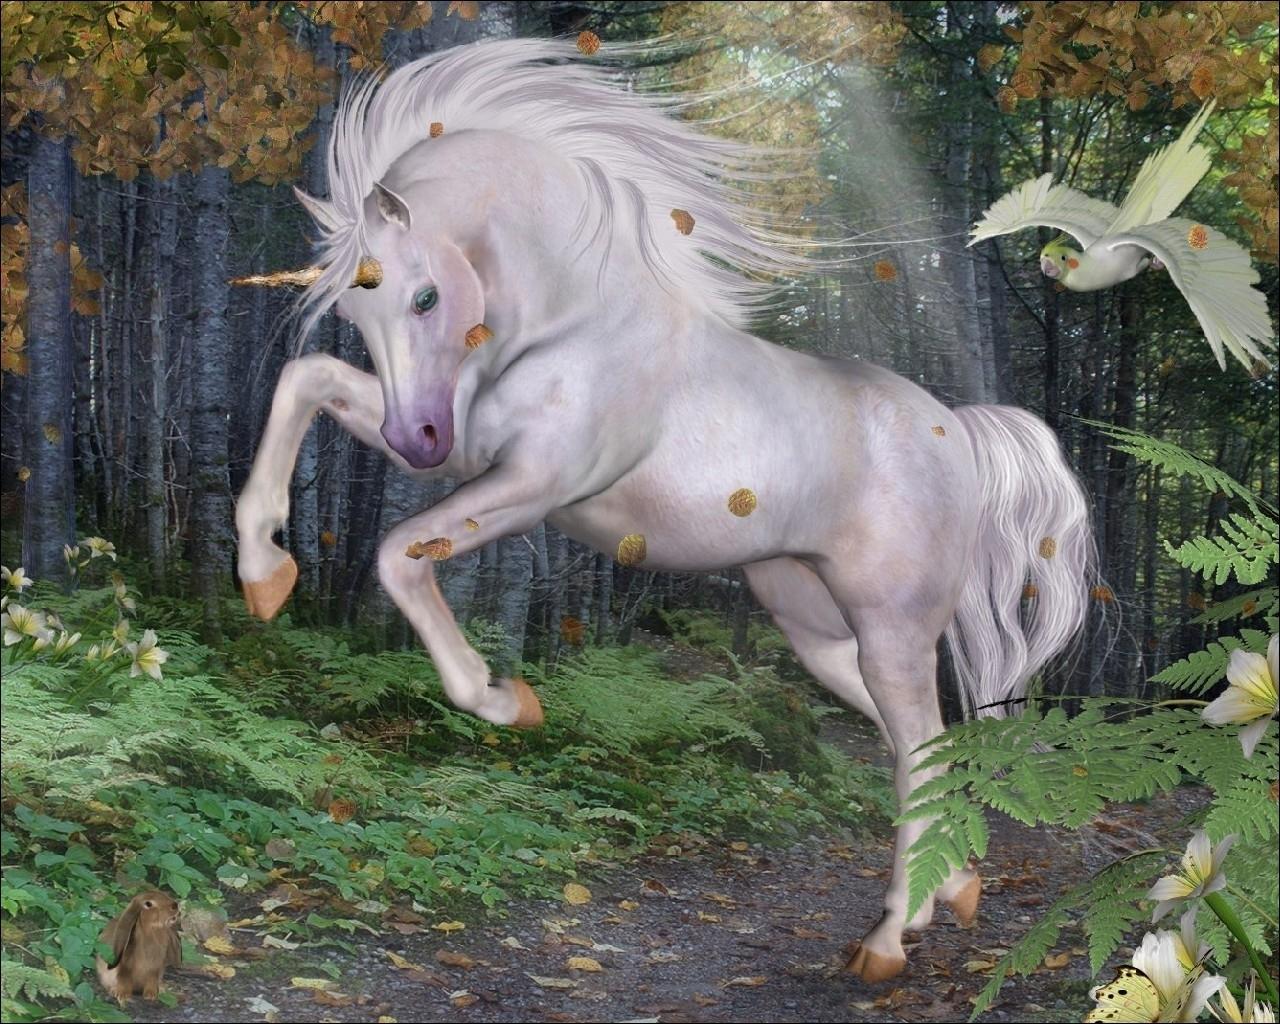 Unicorn Computer Wallpapers Desktop Backgrounds 1280x1024 ID 1280x1024